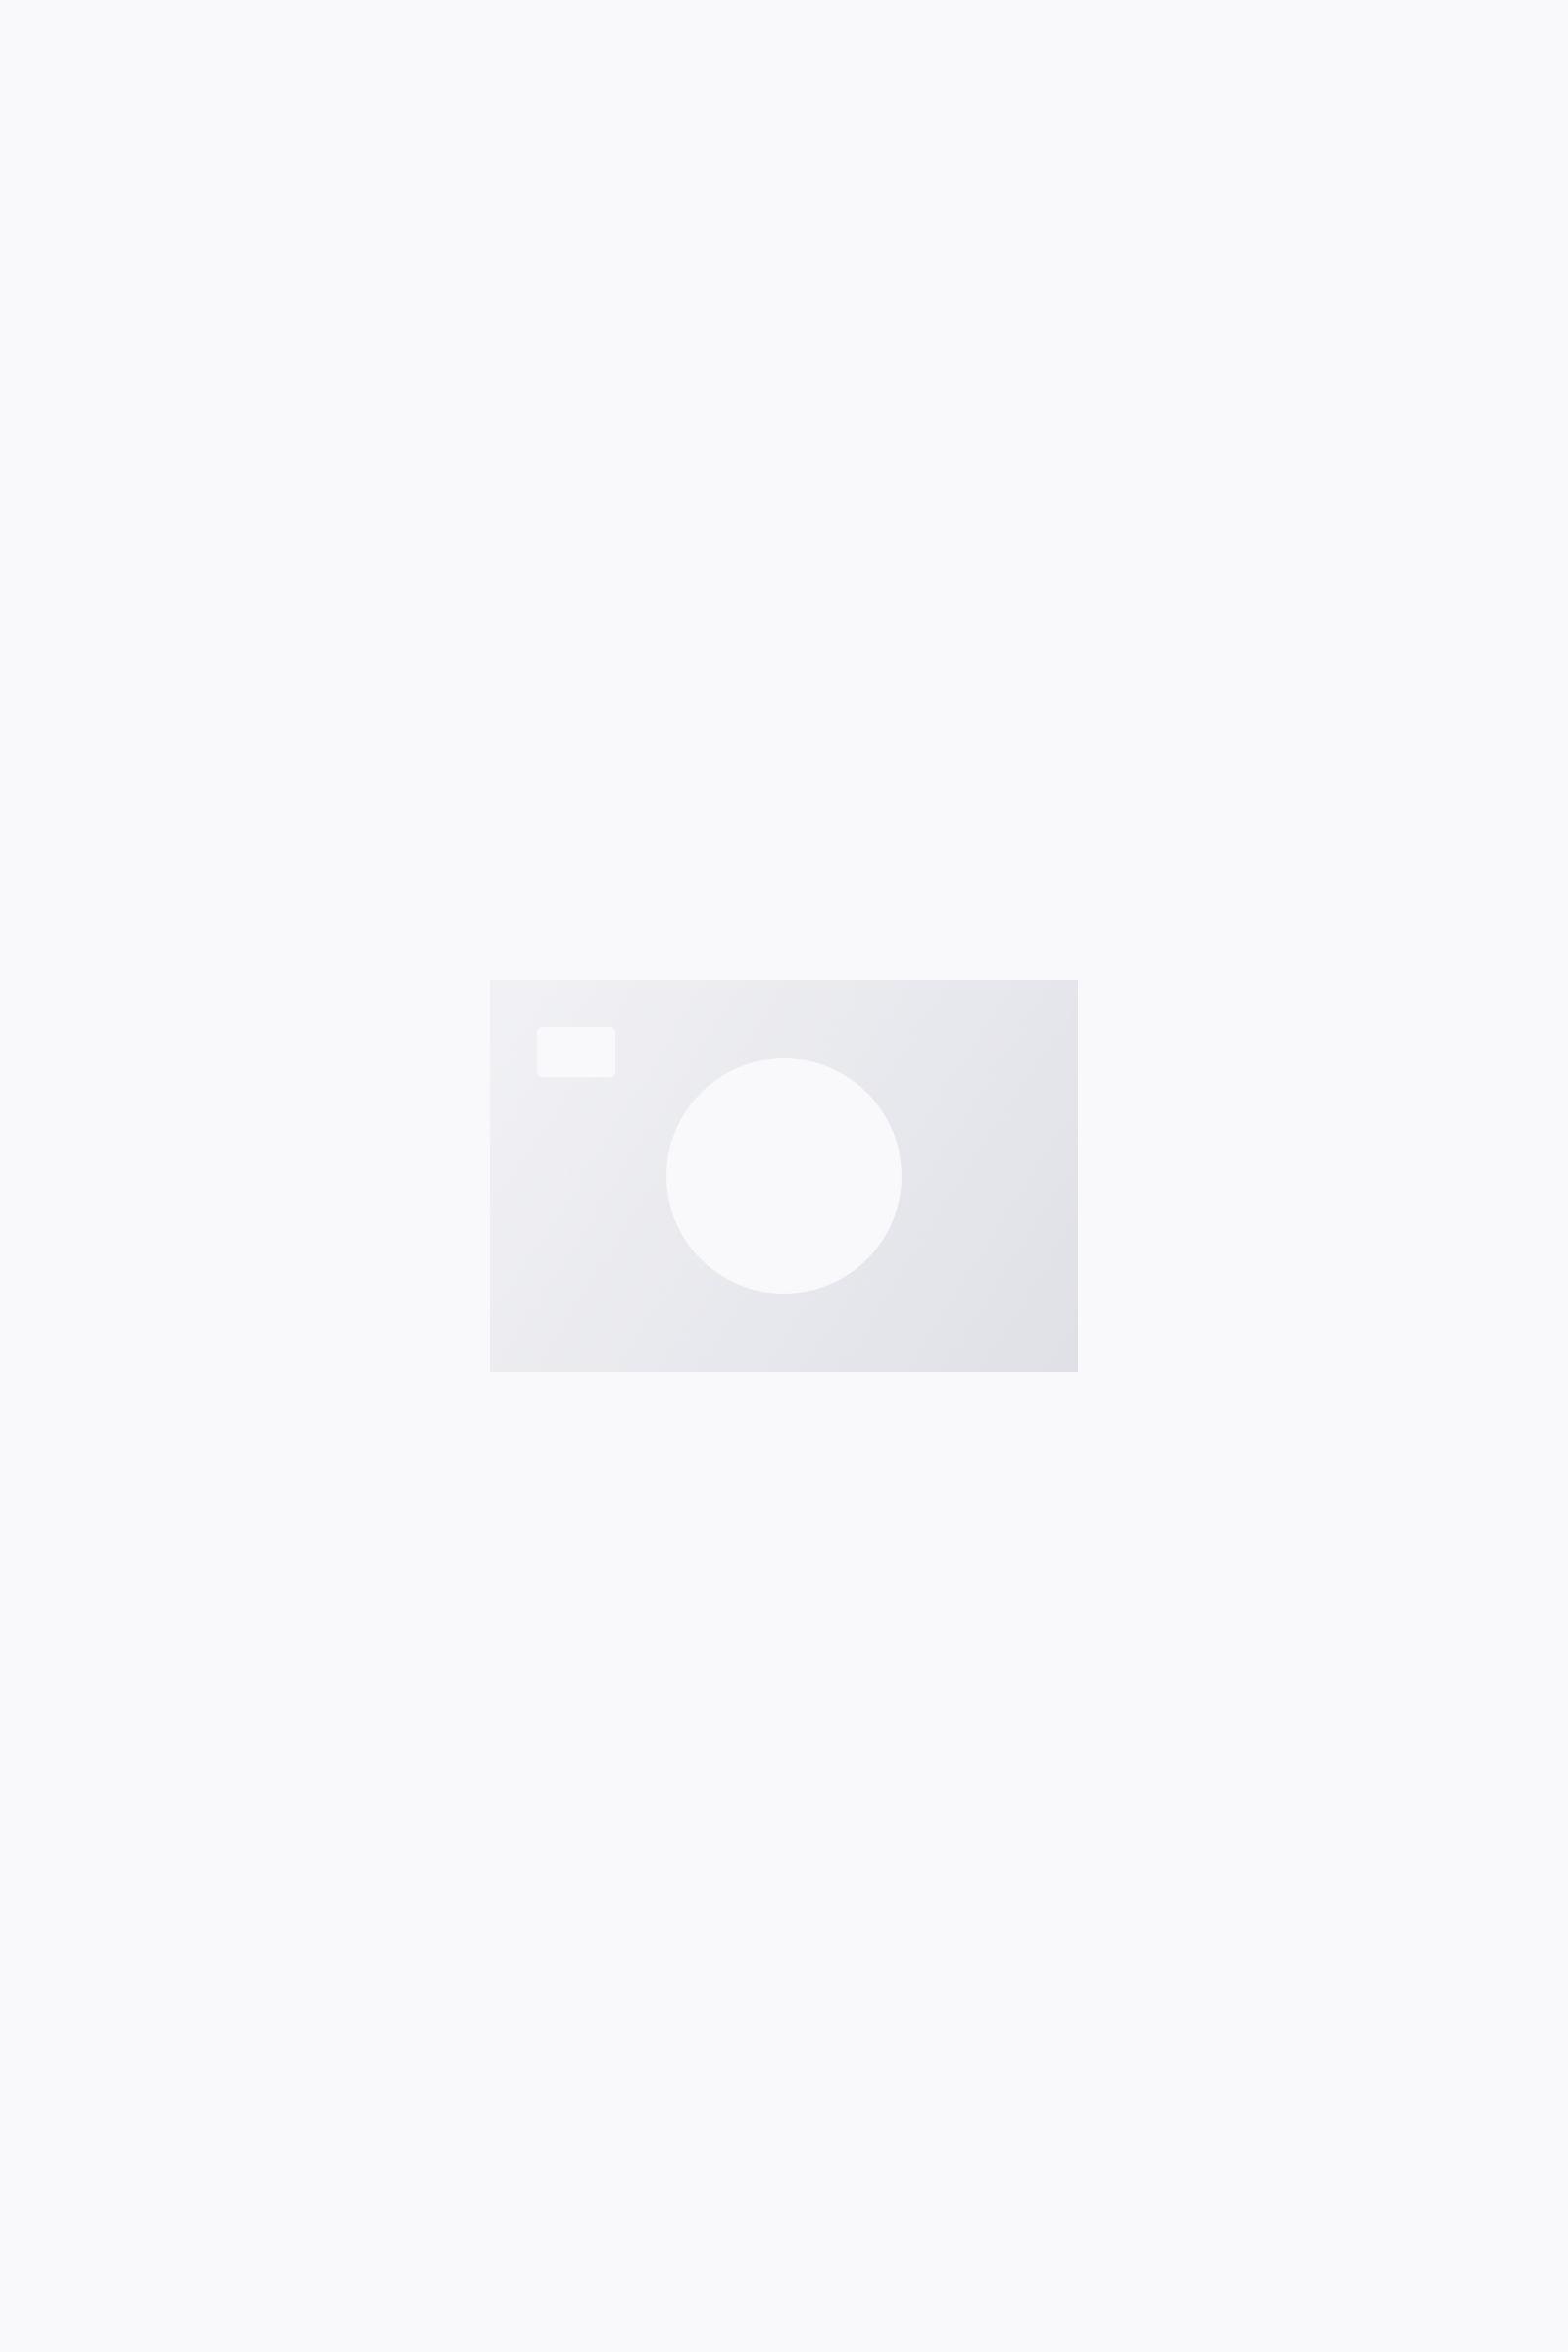 COS SWEAT T-SHIRT,light grey